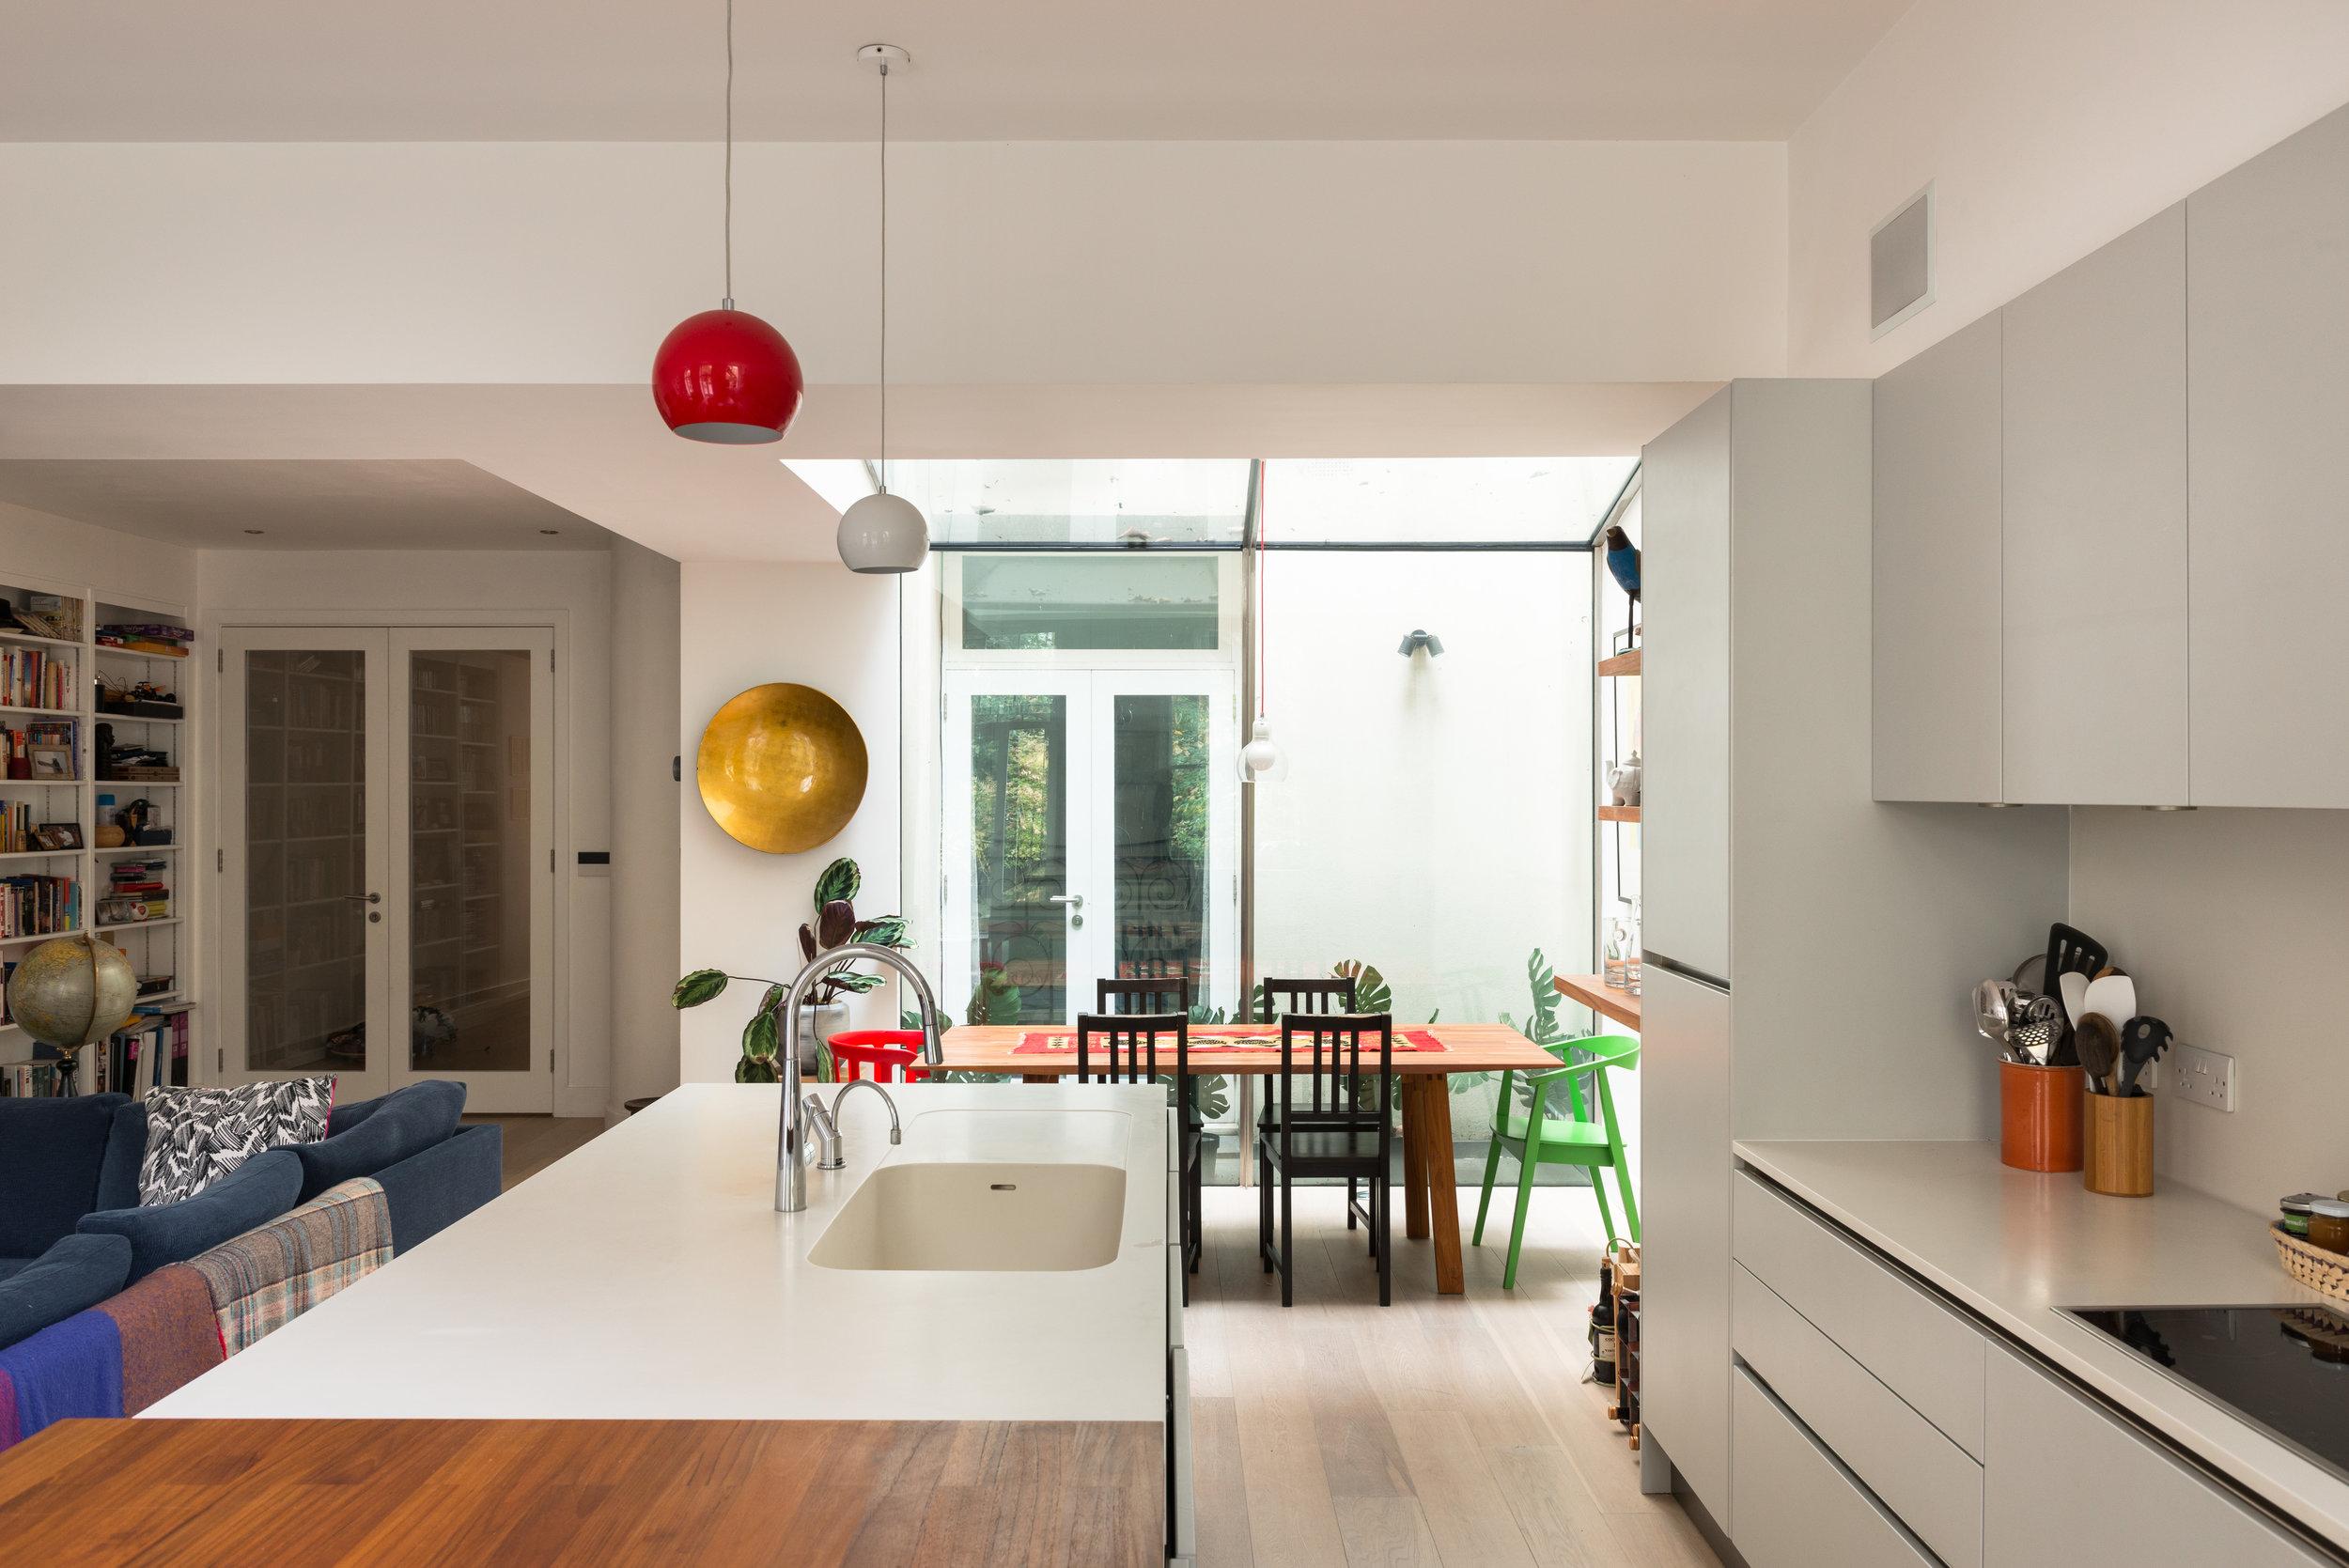 Warrington Crescent Kitchen Dining - MW Architects